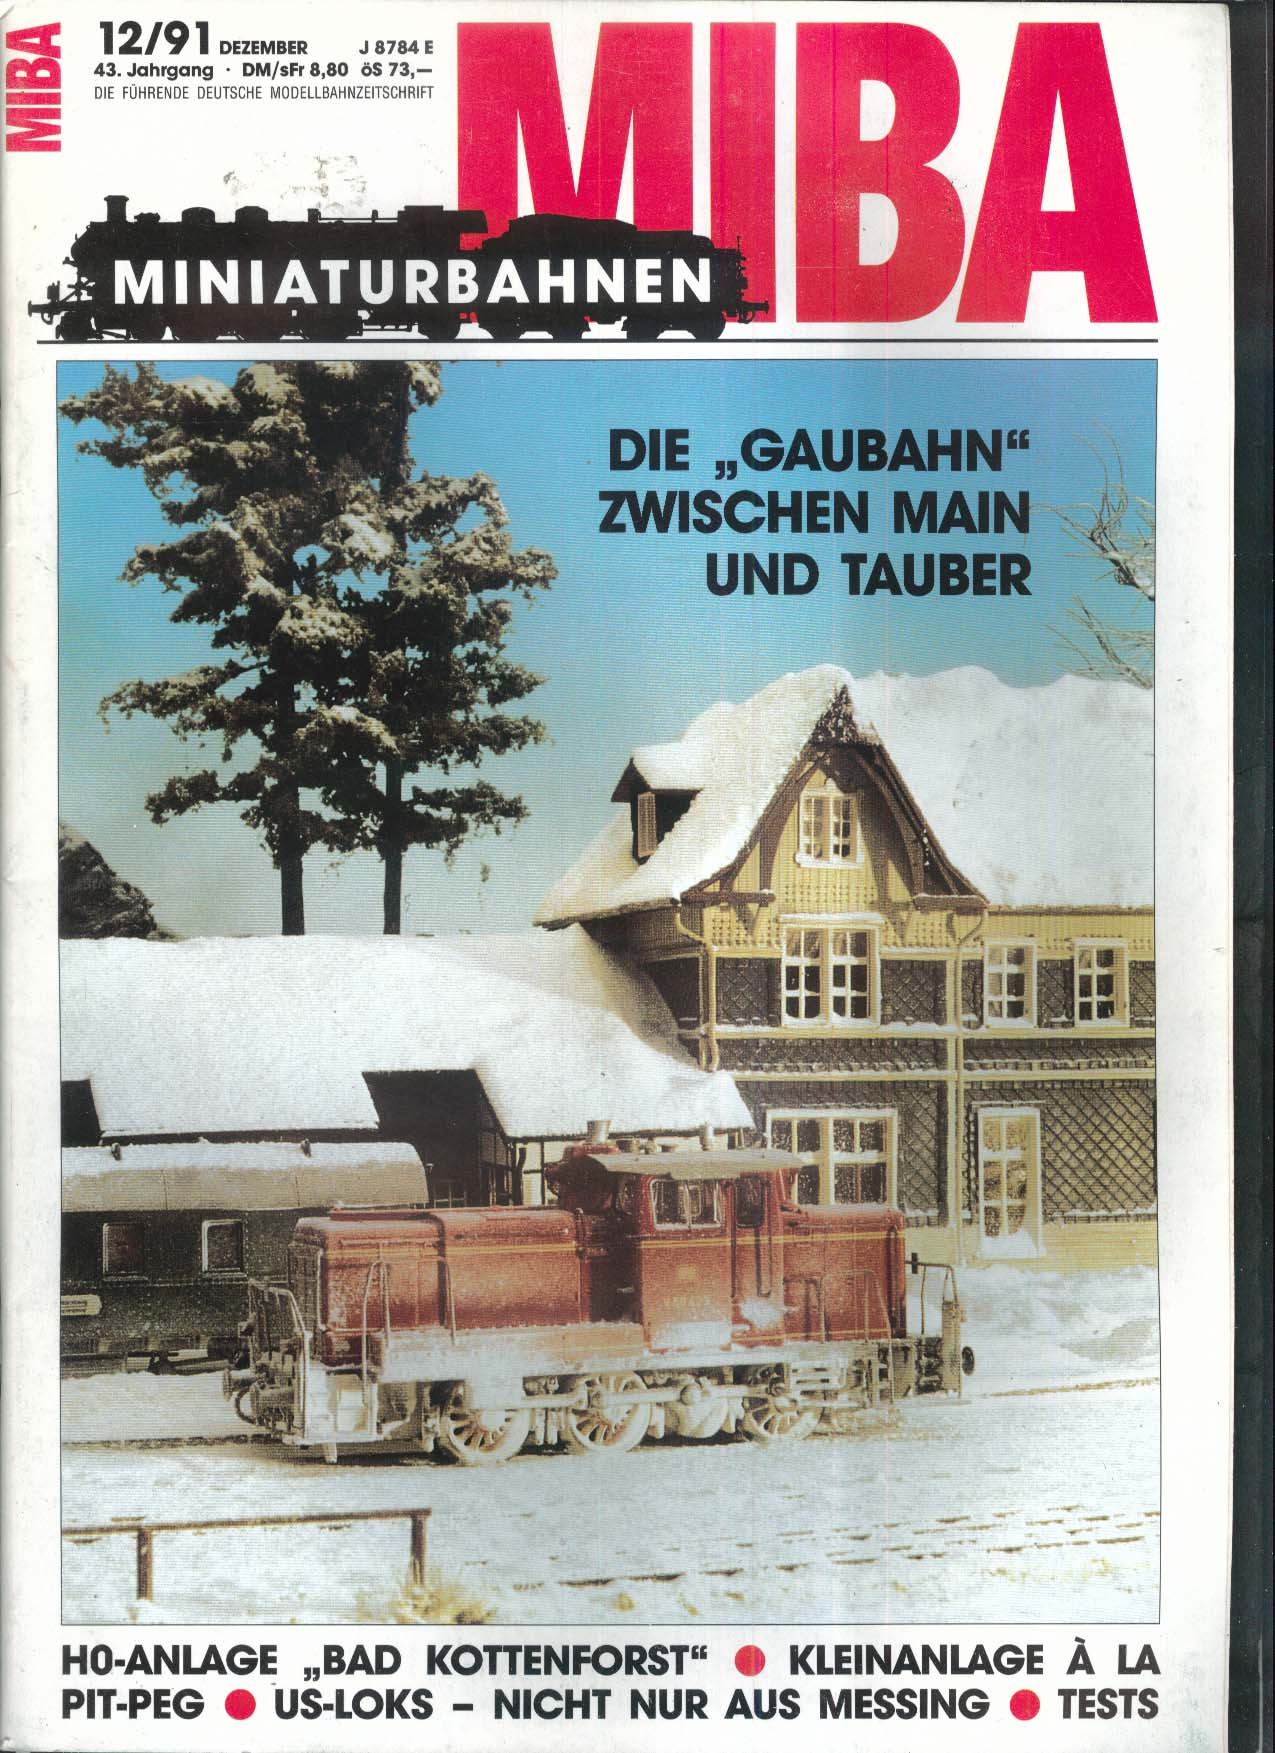 MIBA-Miniaturbahnen German-language model train magazine Gaubahn 12 1991